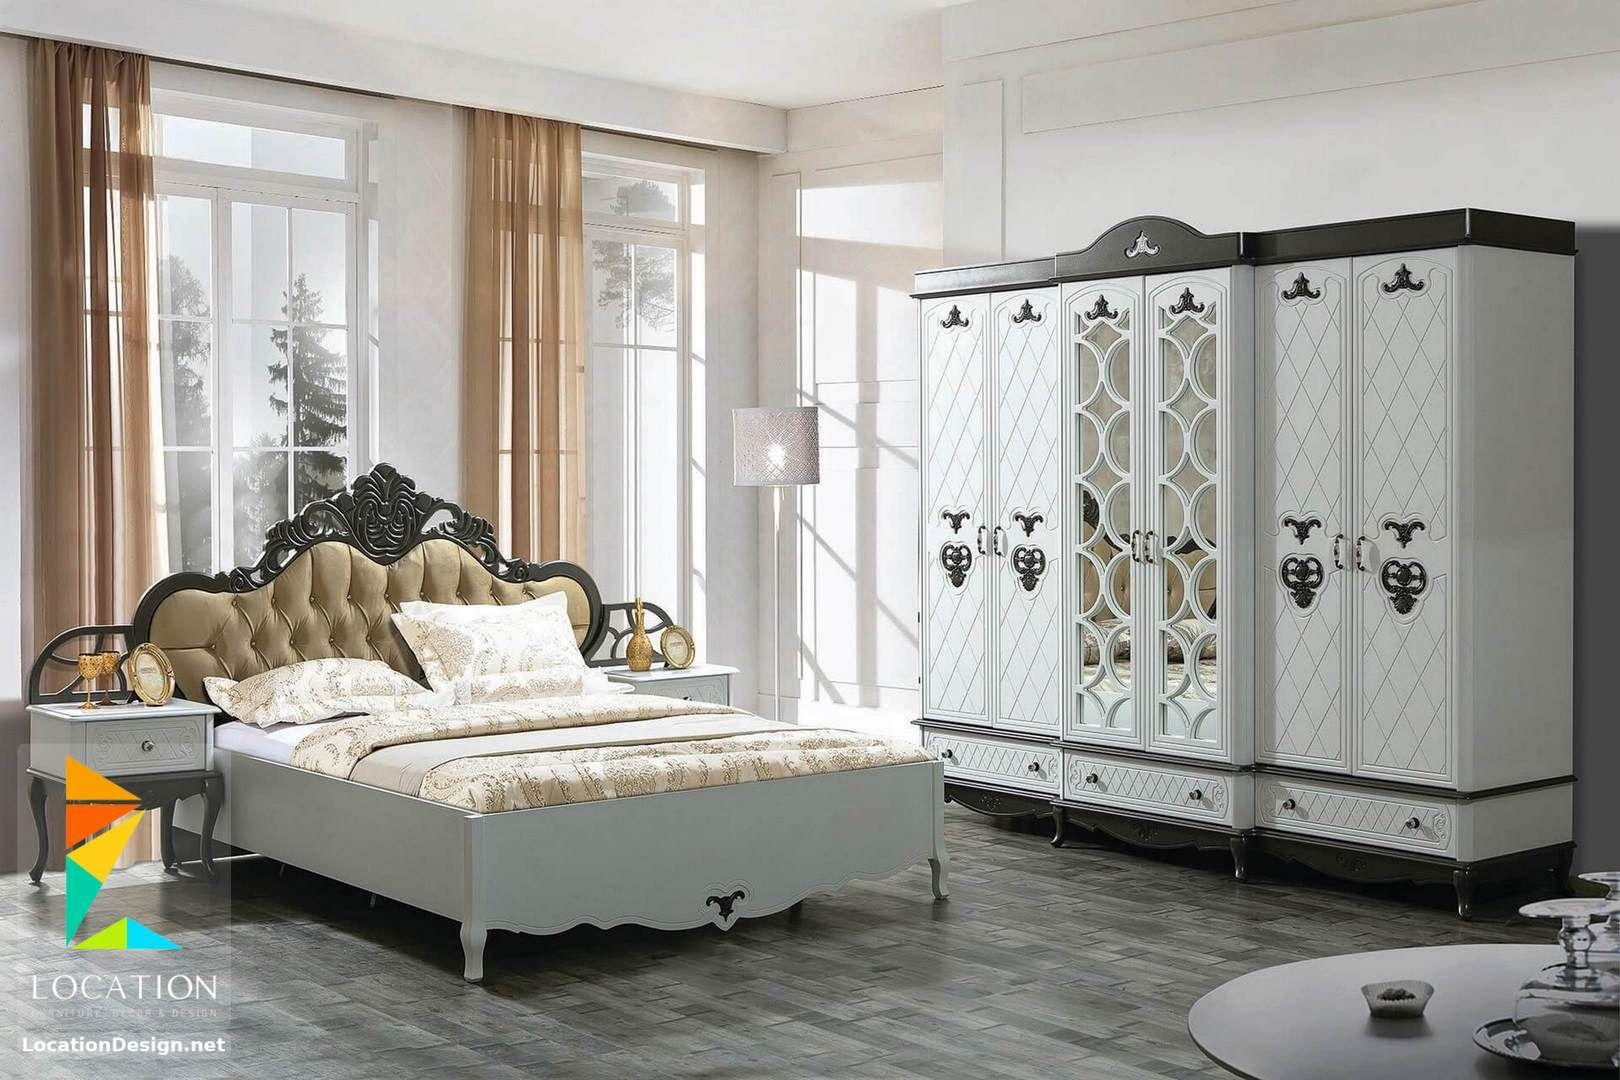 صور غرف نوم 2019 كامله احدث تصميمات غرف النوم للعرسان لوكشين ديزين نت Home Decor Home Youth Bedroom